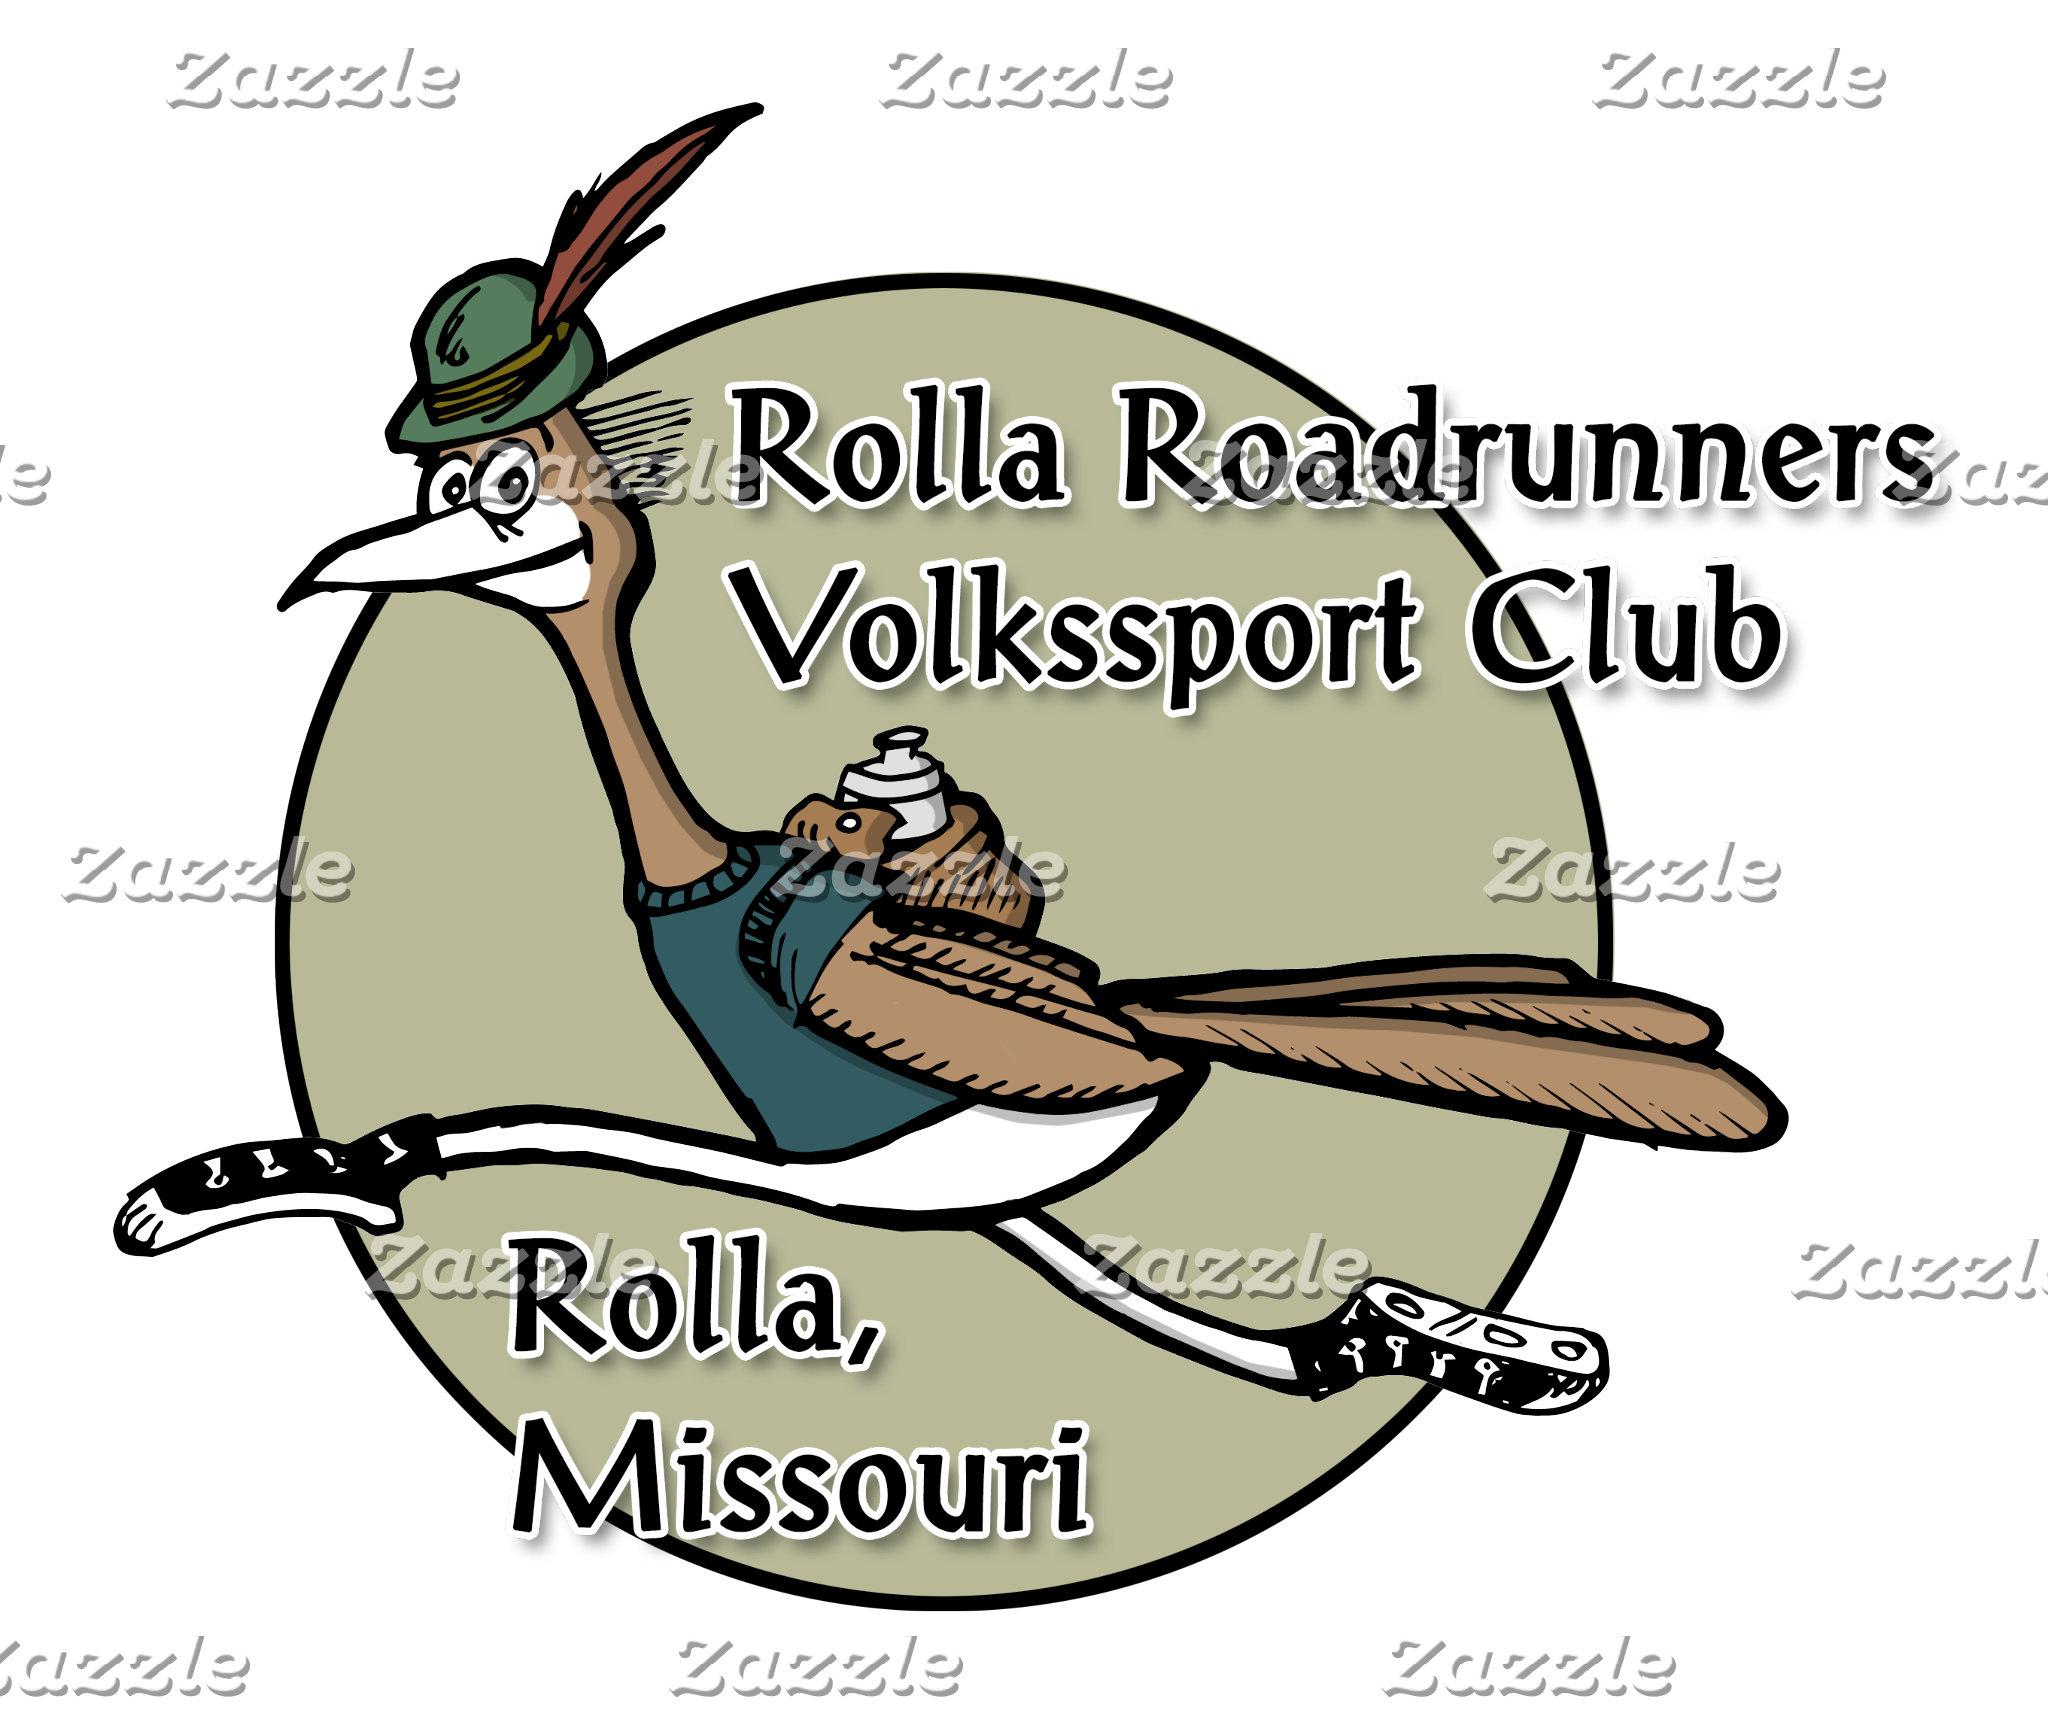 Rolla Roadrunners